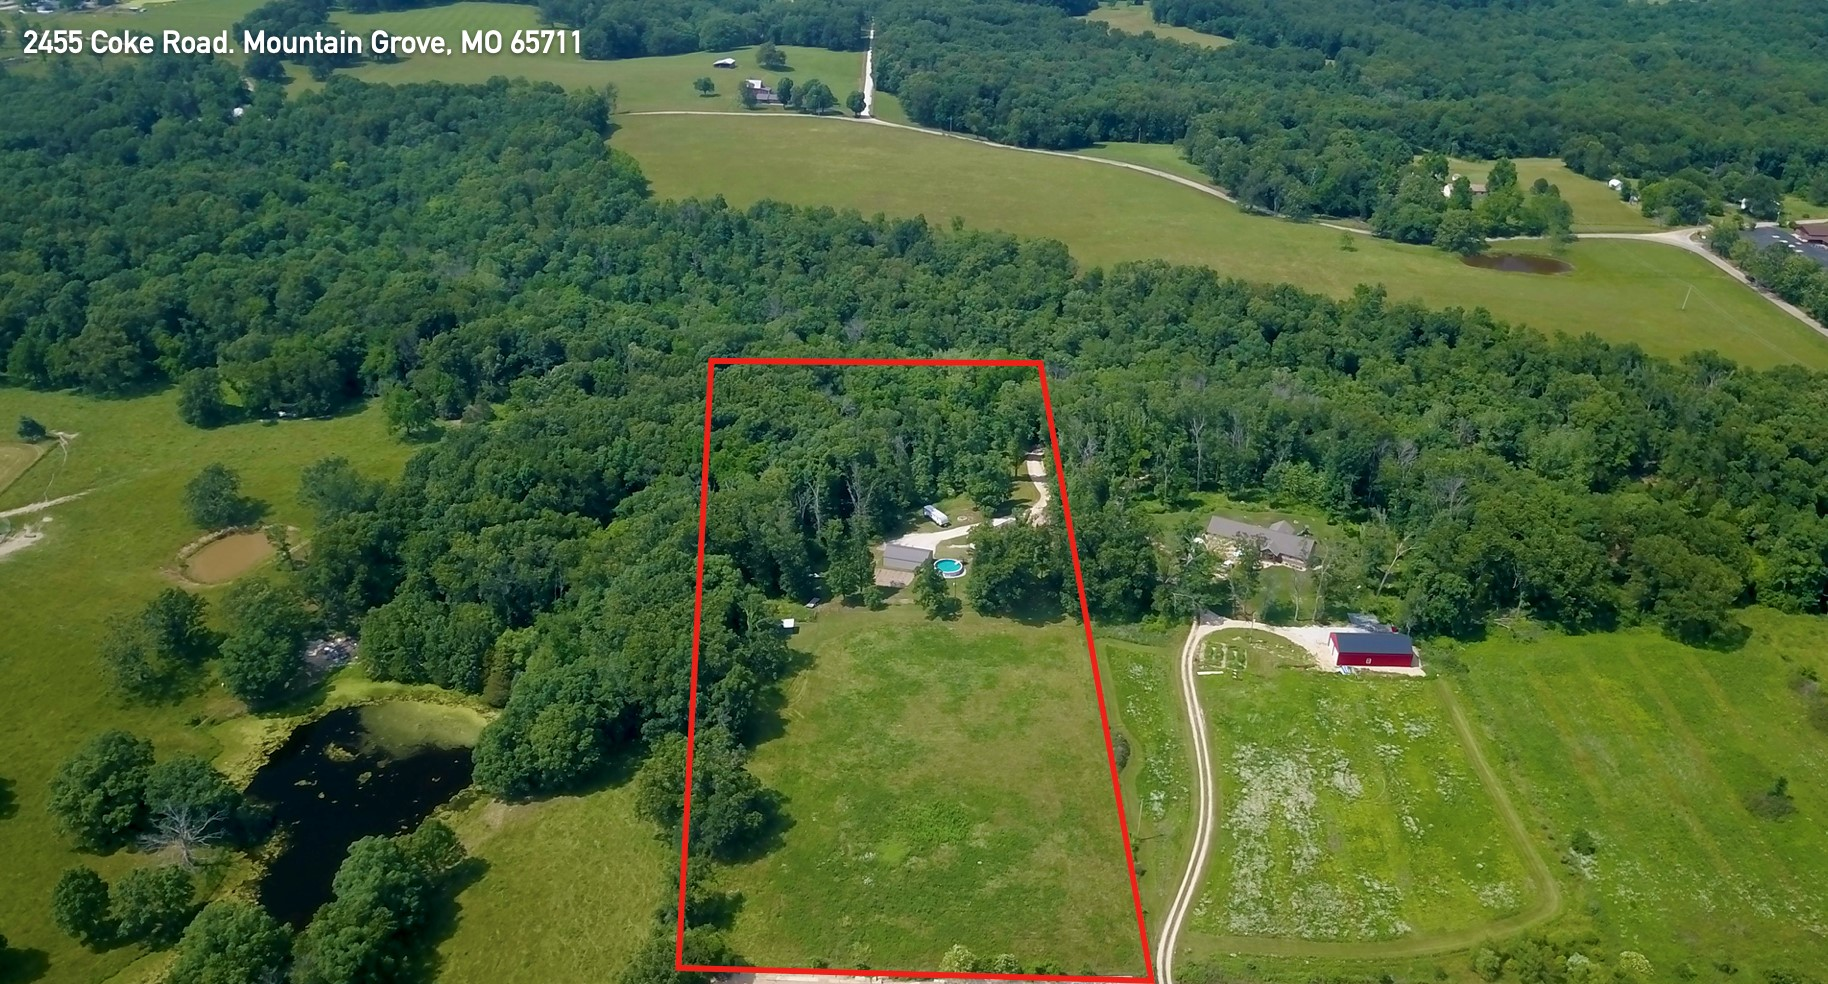 Southern Missouri Home for Sale – Mountain Grove, MO